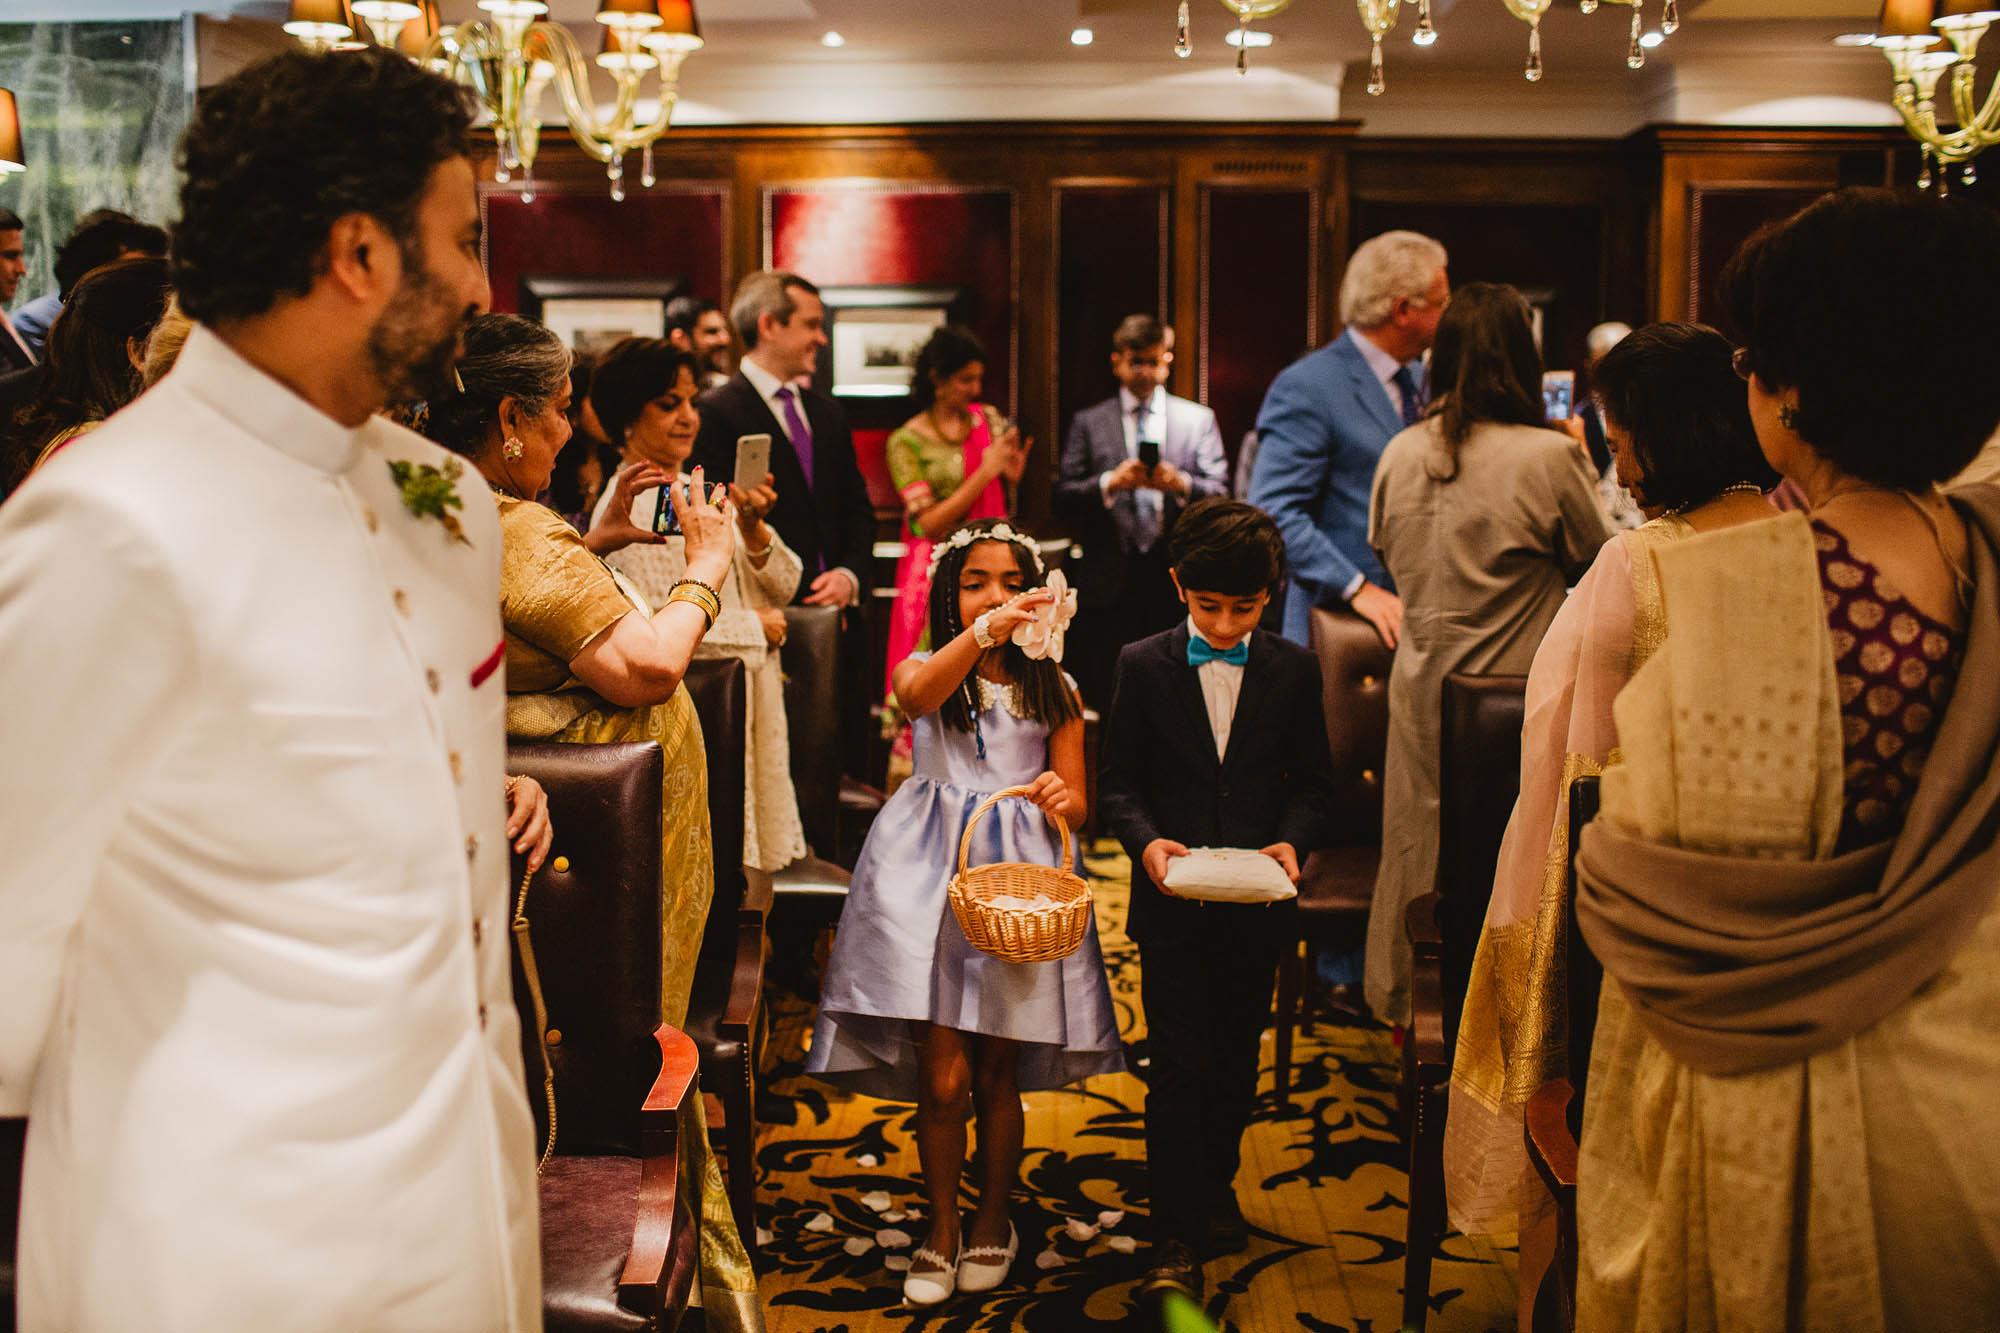 Goring hotel London wedding 12